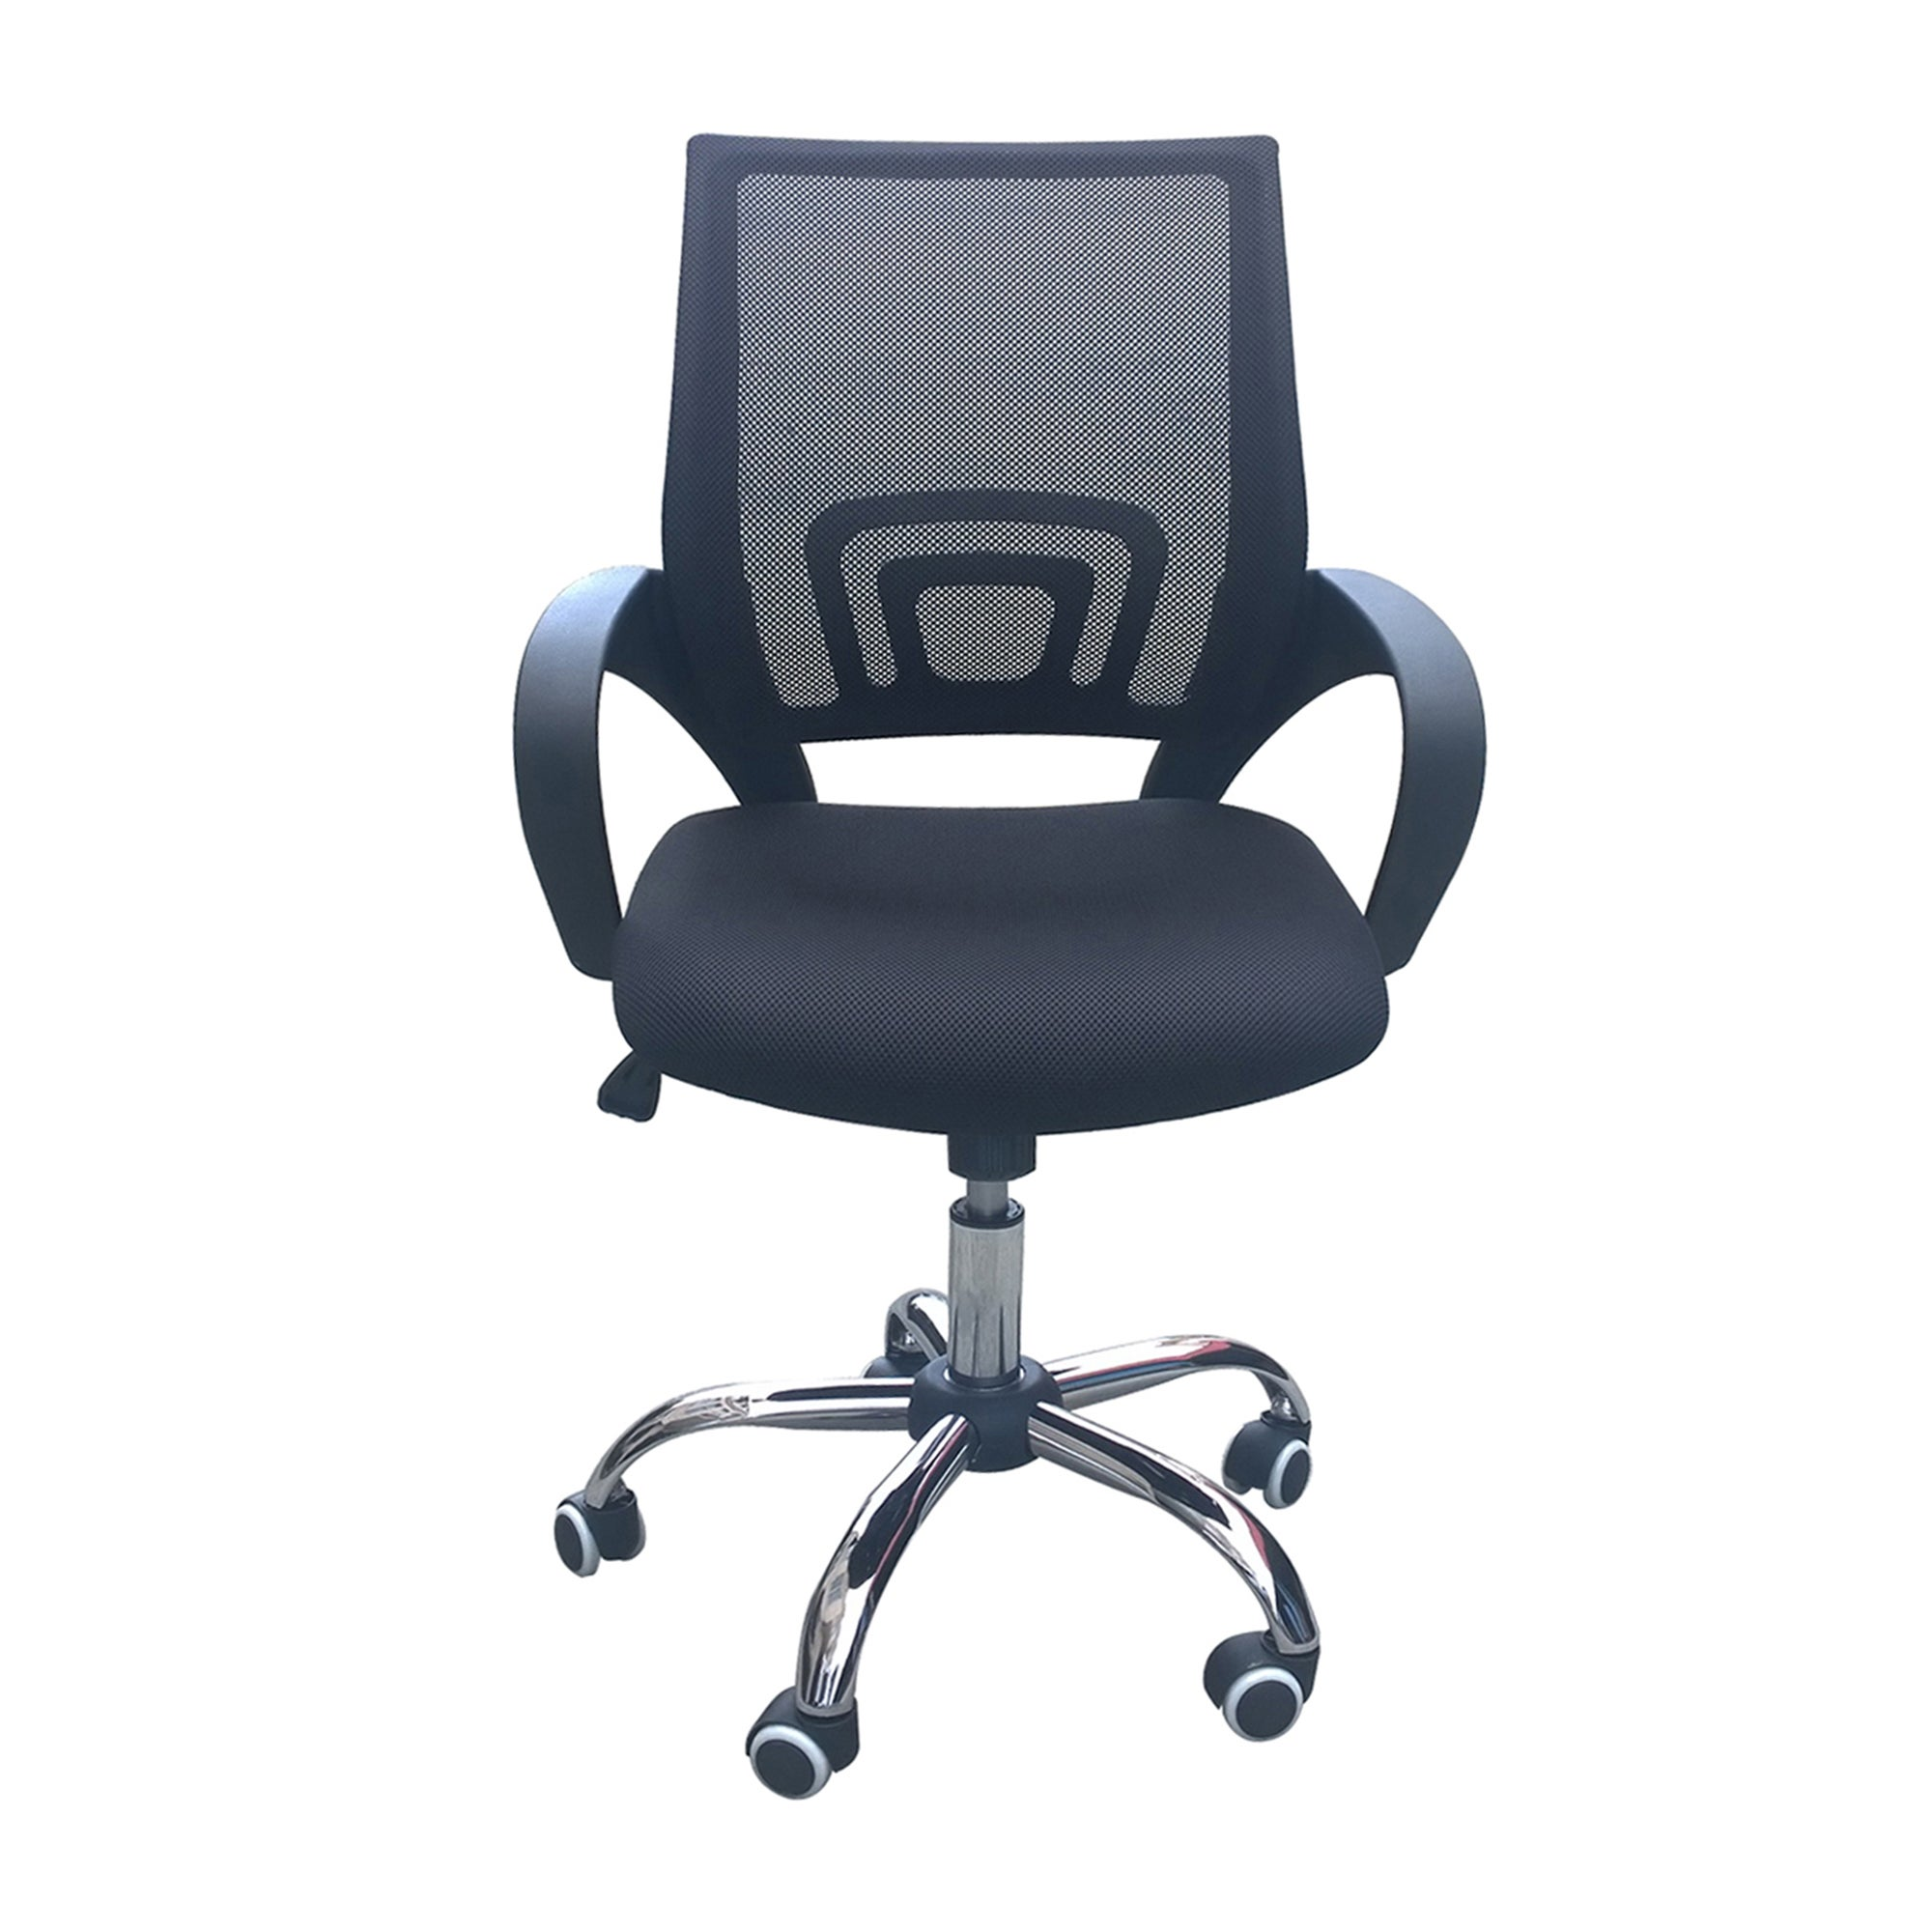 Tate Mesh Back Office Chair Black